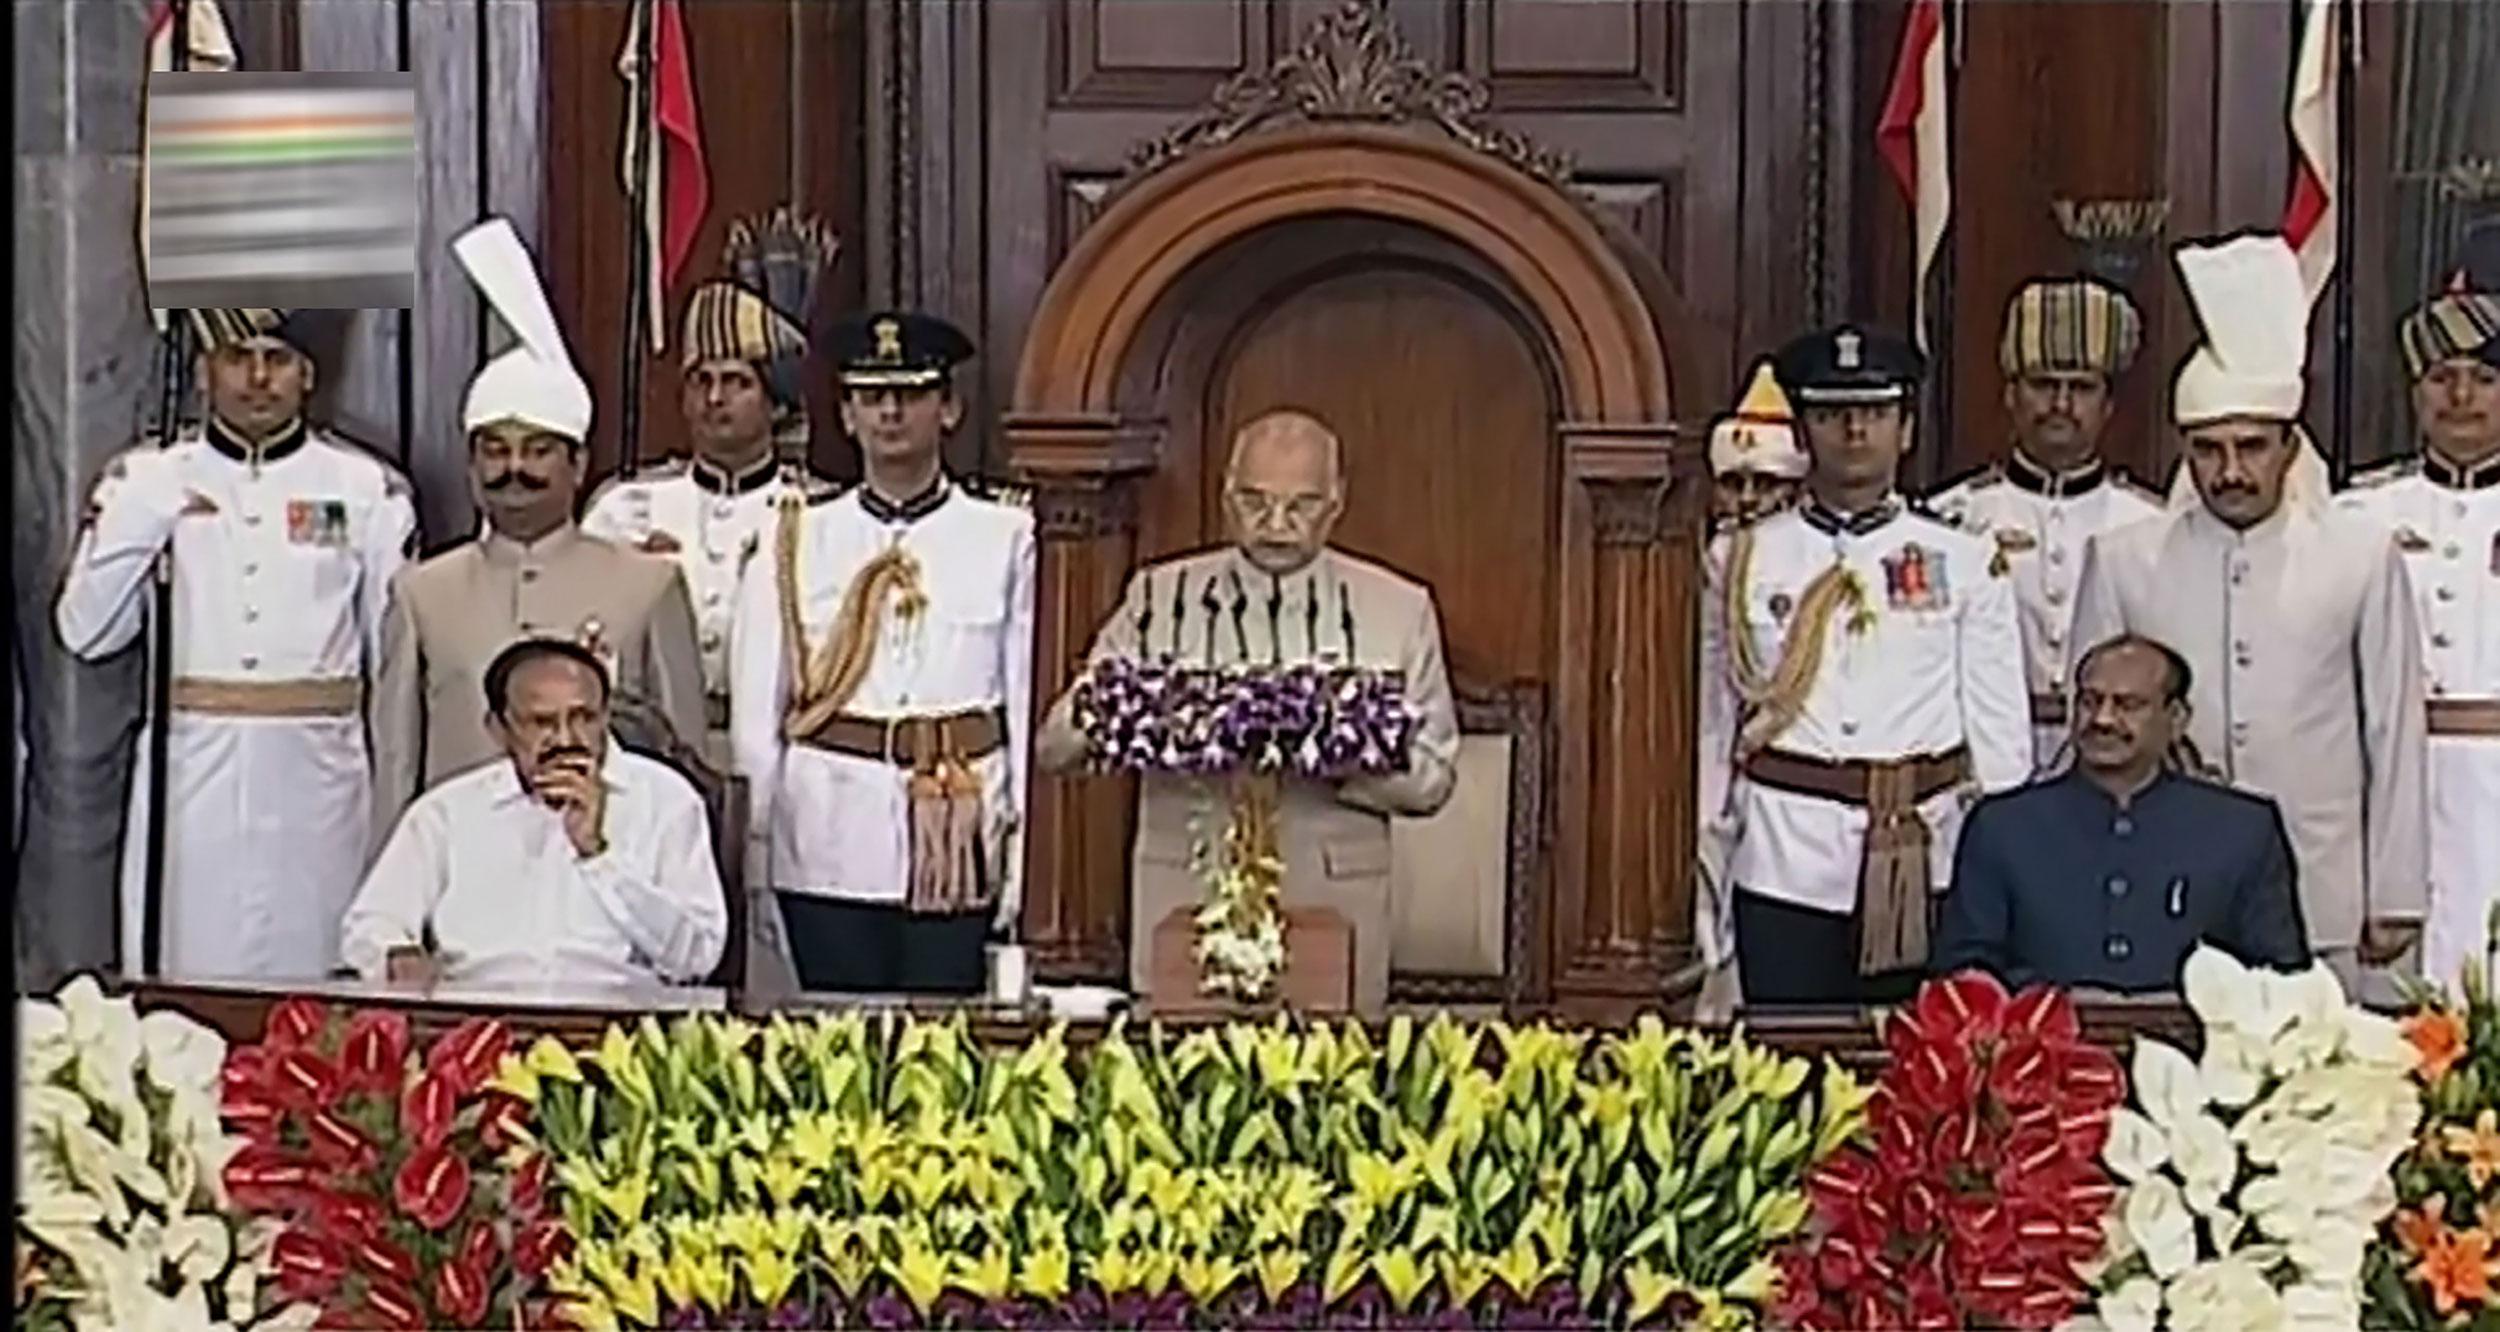 President Ram Nath Kovind addresses a joint session of Parliament in the presence of Vice President Venkaiah Naidu and Lok Sabha Speaker Om Birla, in New Delhi, on June 20, 2019.